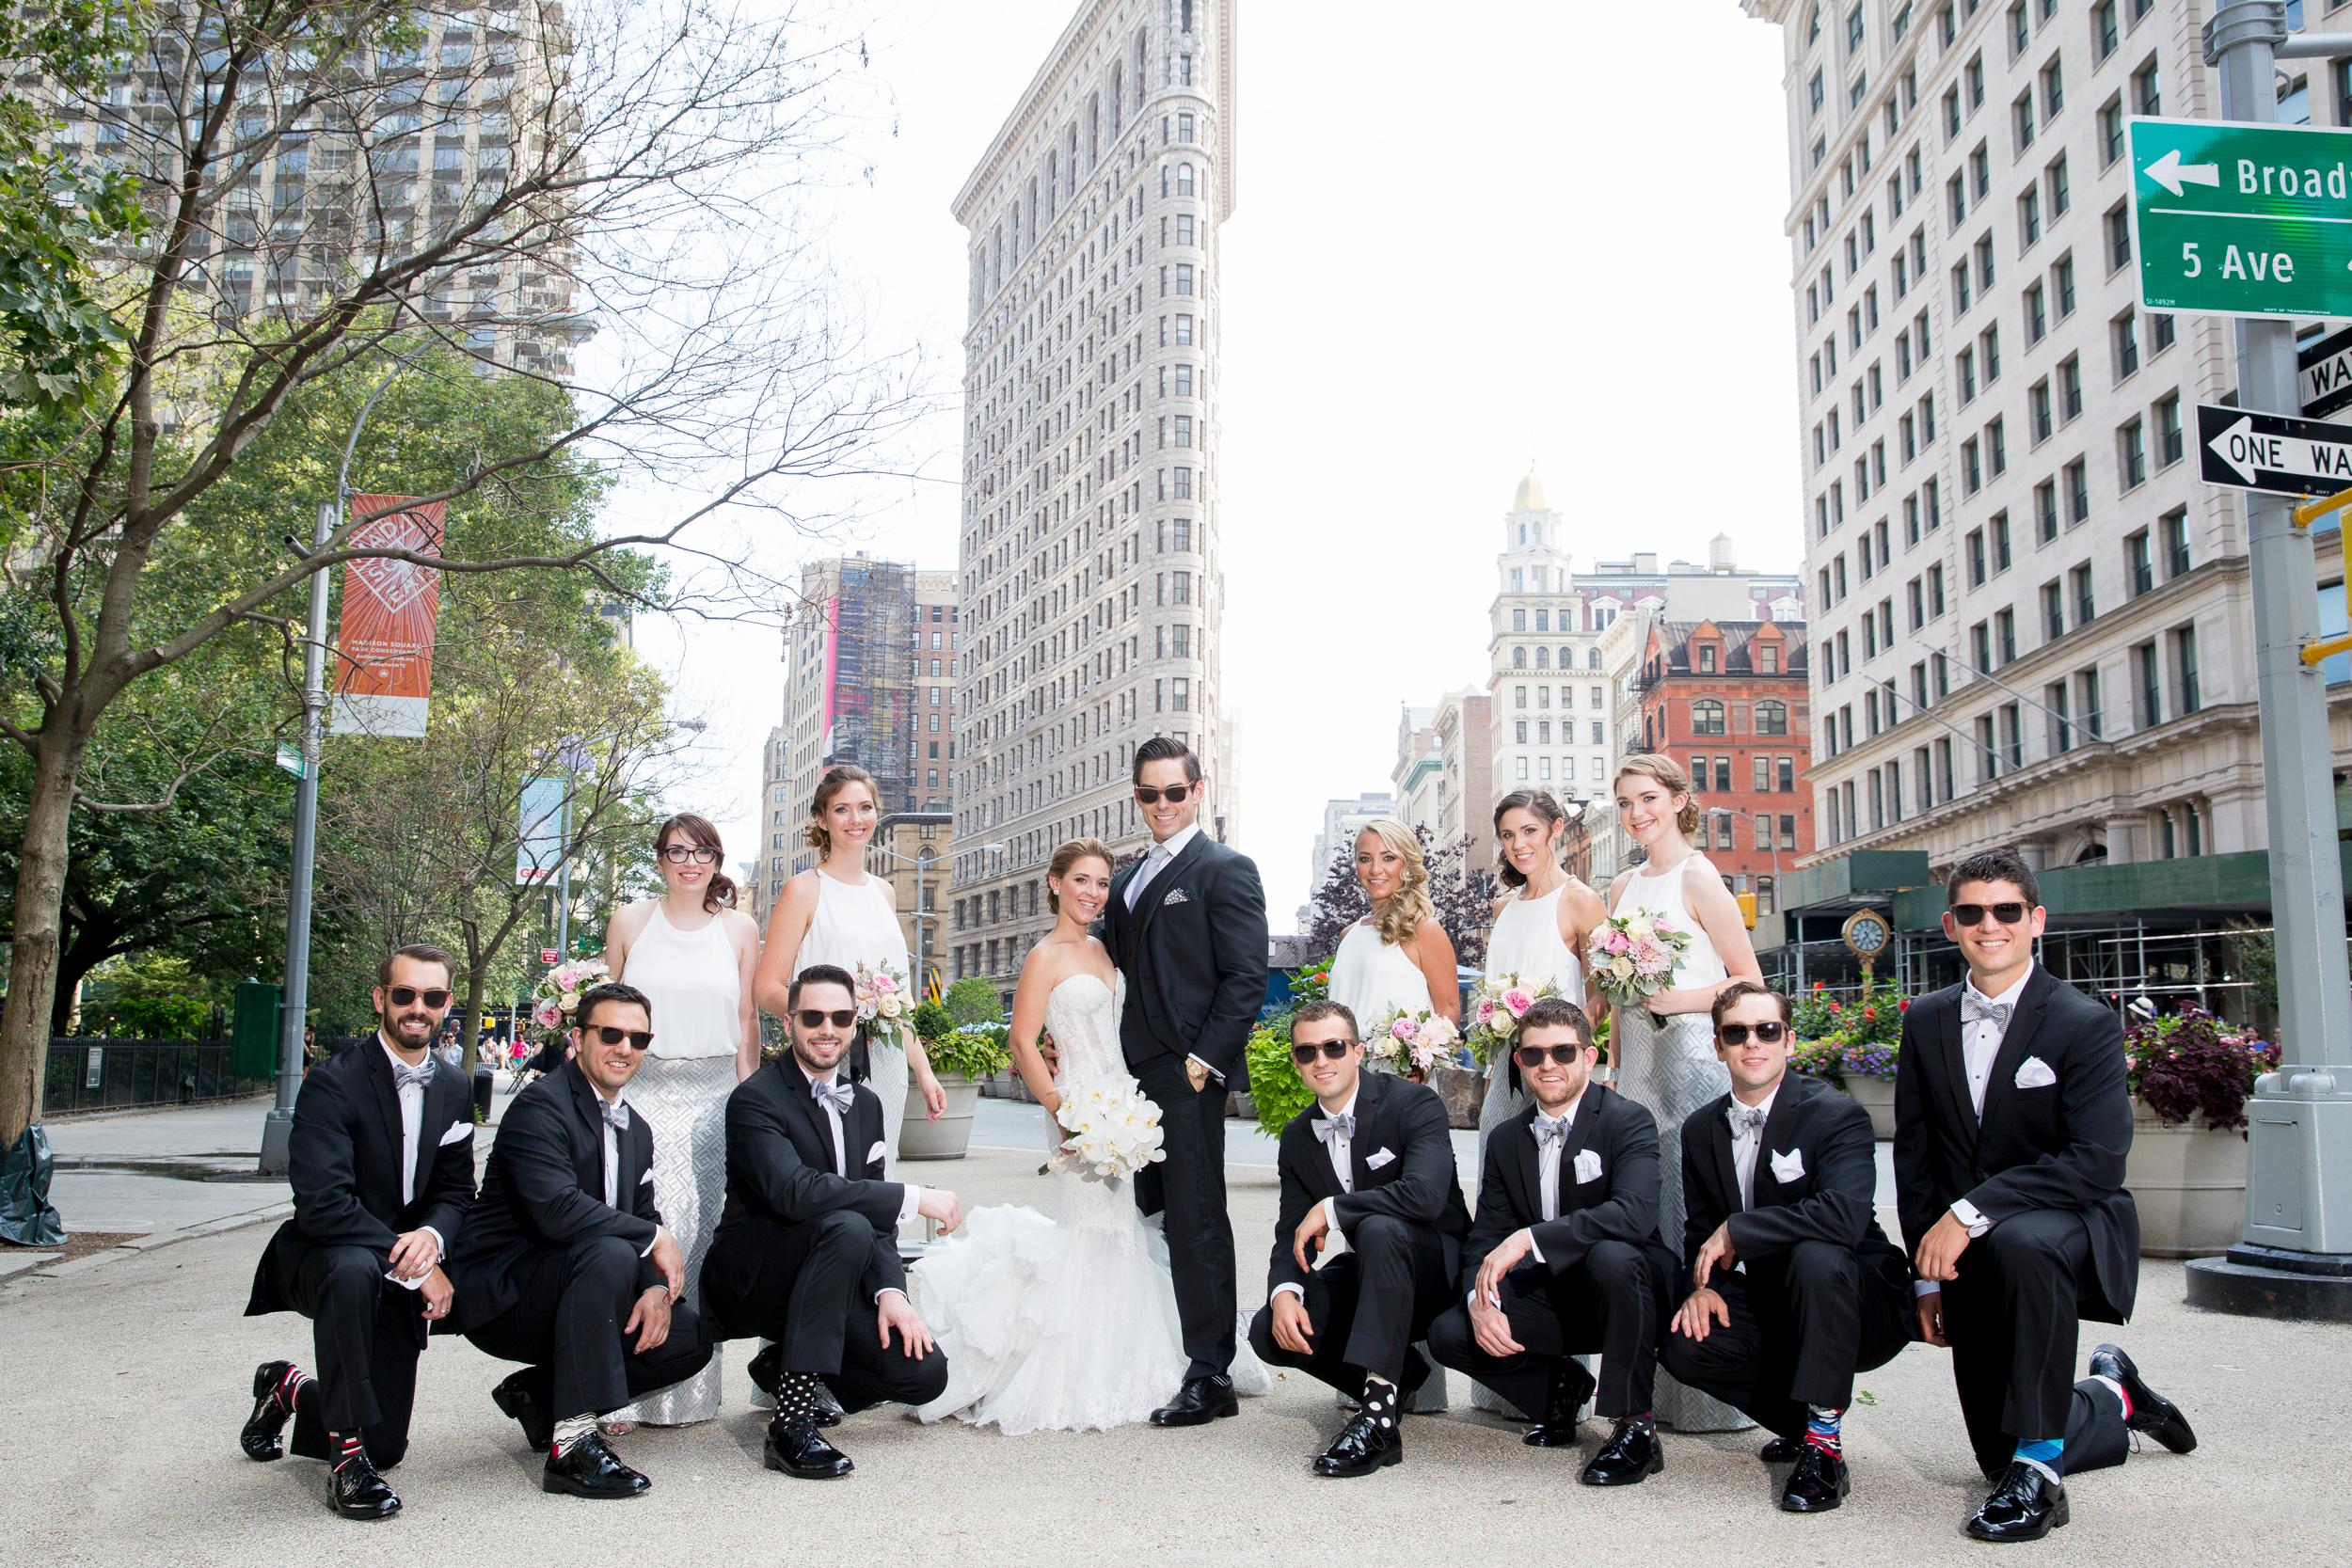 Ceci_New_York_Style_Luxury_Custom_Summer_Wedding_CeciBride_Letterpress_NewYork_Foil_Lighthouse_Chelsea_Piers_30.jpg